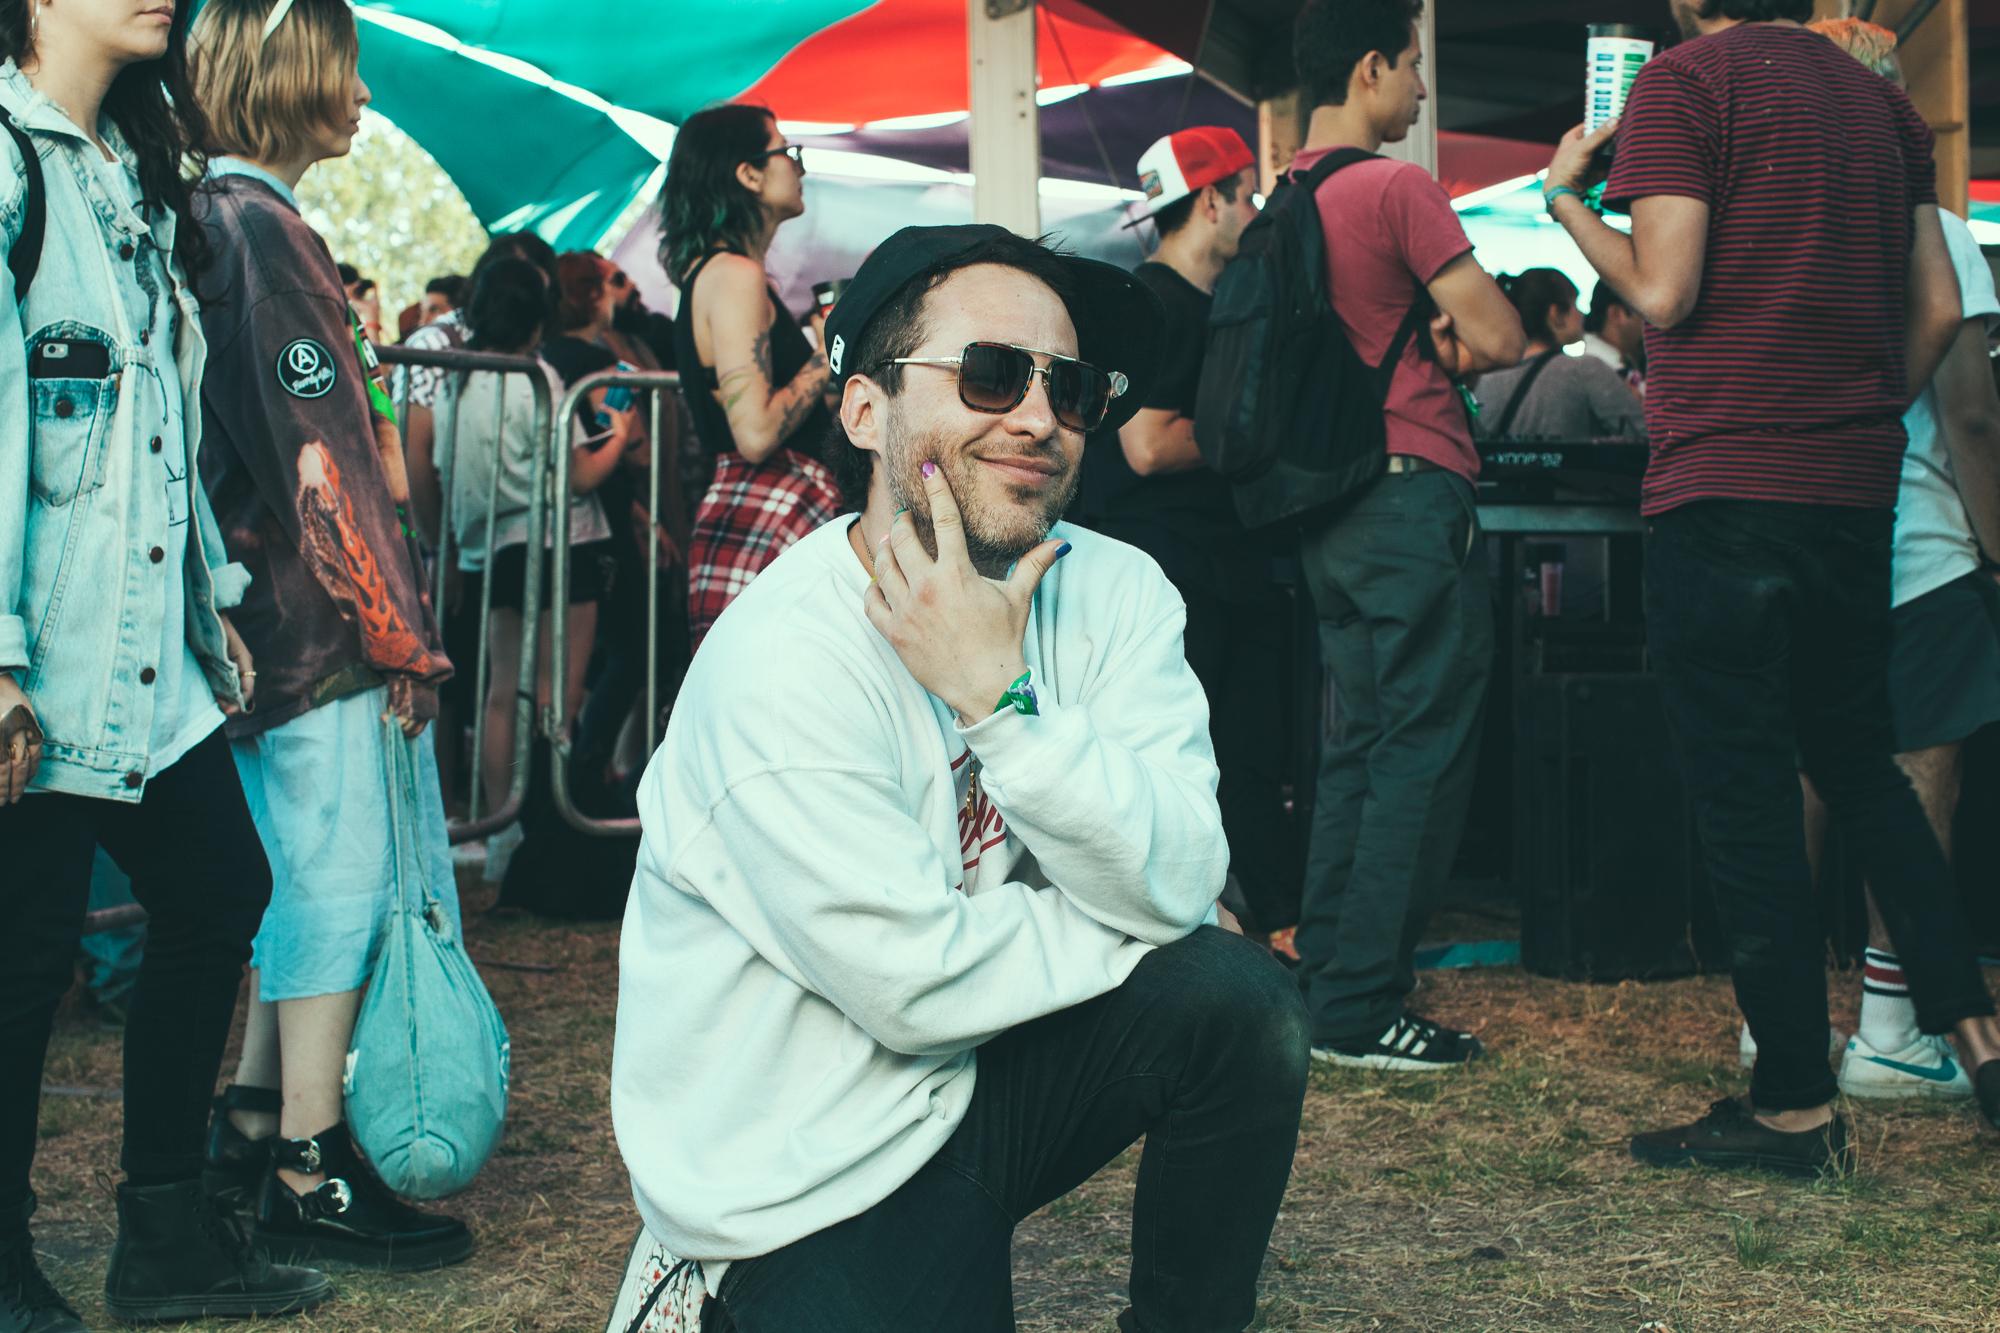 AJ Davila-Festival Ceremonia-Mexico-Foro Pegaso-04.02.2017-Daniel Patlan_Desde 1989 (1 of 9).jpg